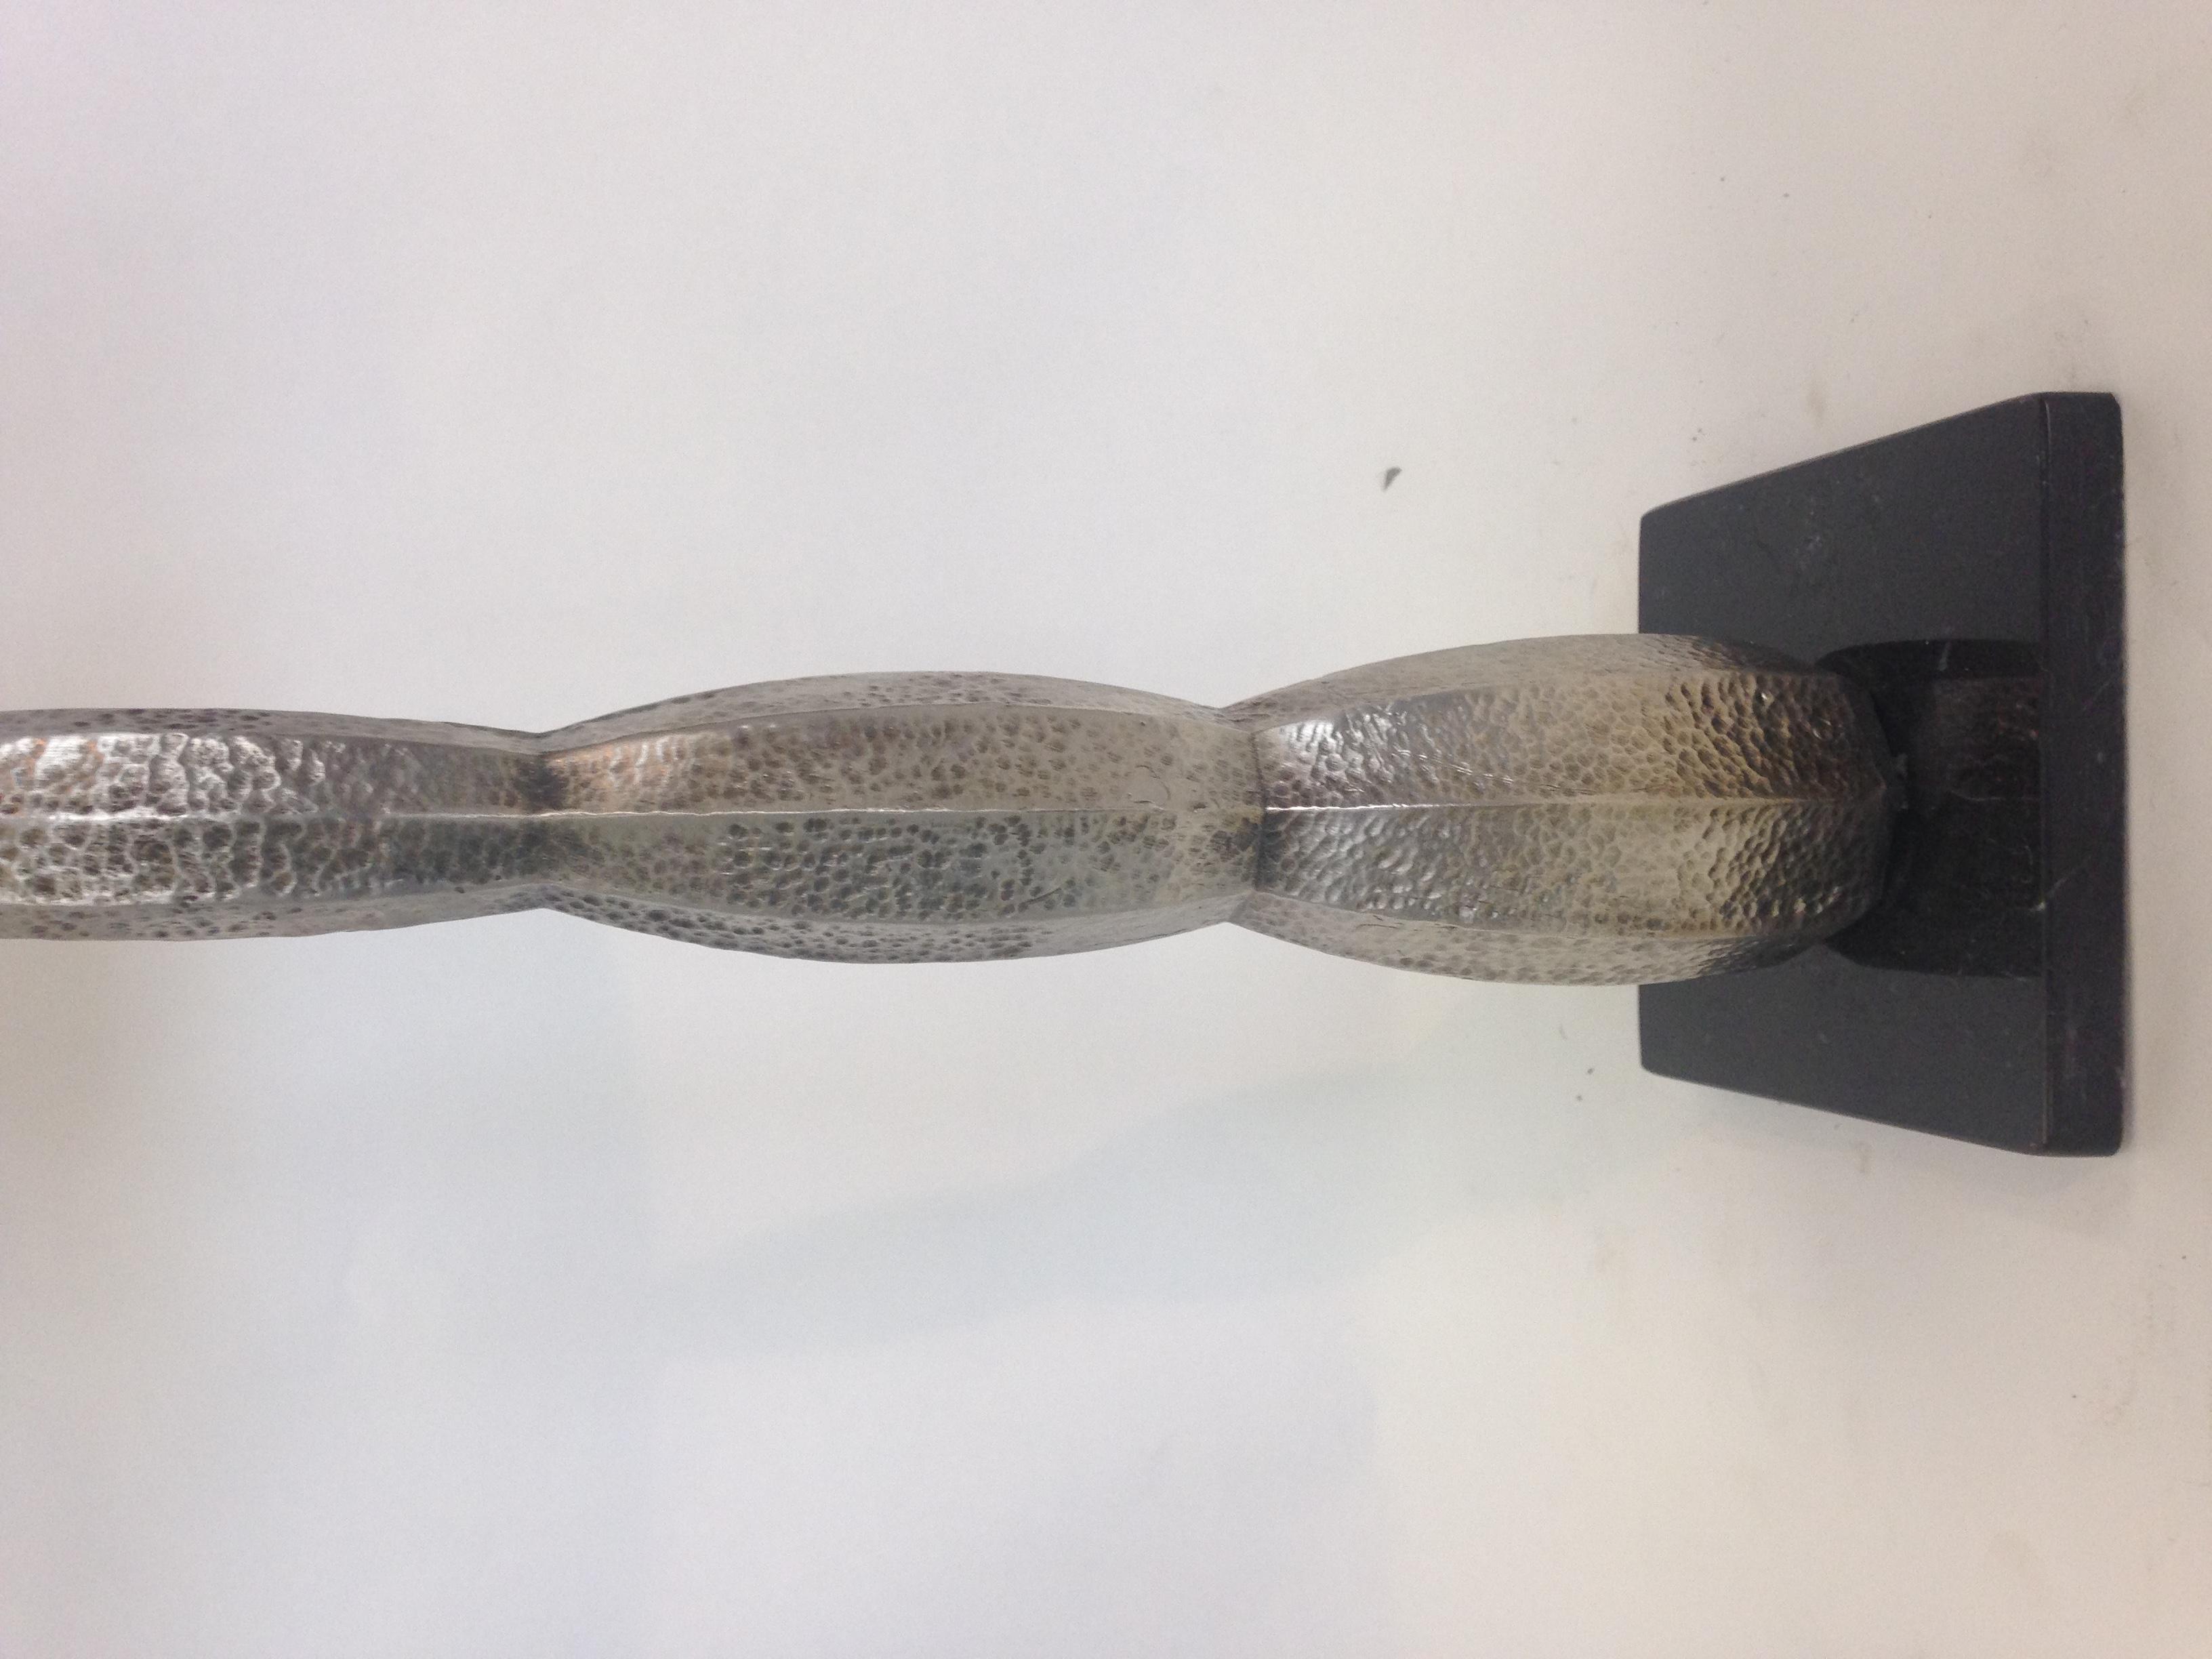 Turri lamp body